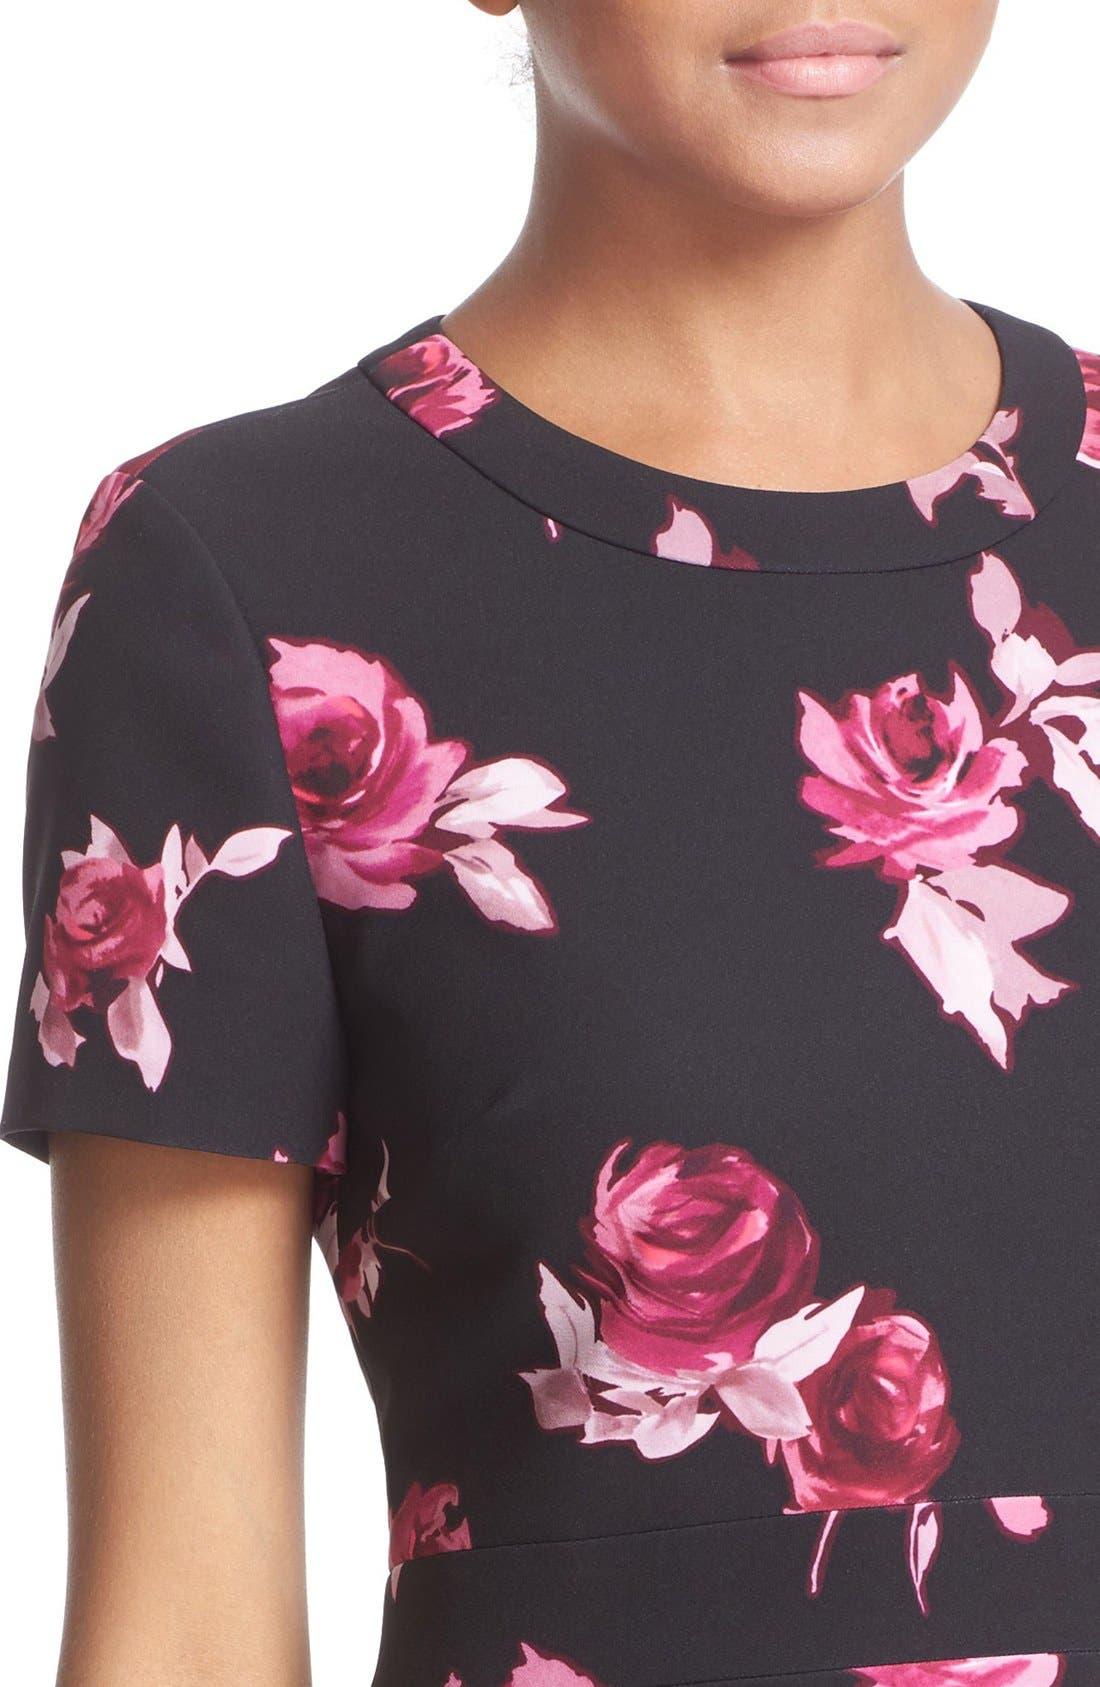 KATE SPADE NEW YORK, 'encore rose' crepe fit & flare dress, Alternate thumbnail 4, color, 001